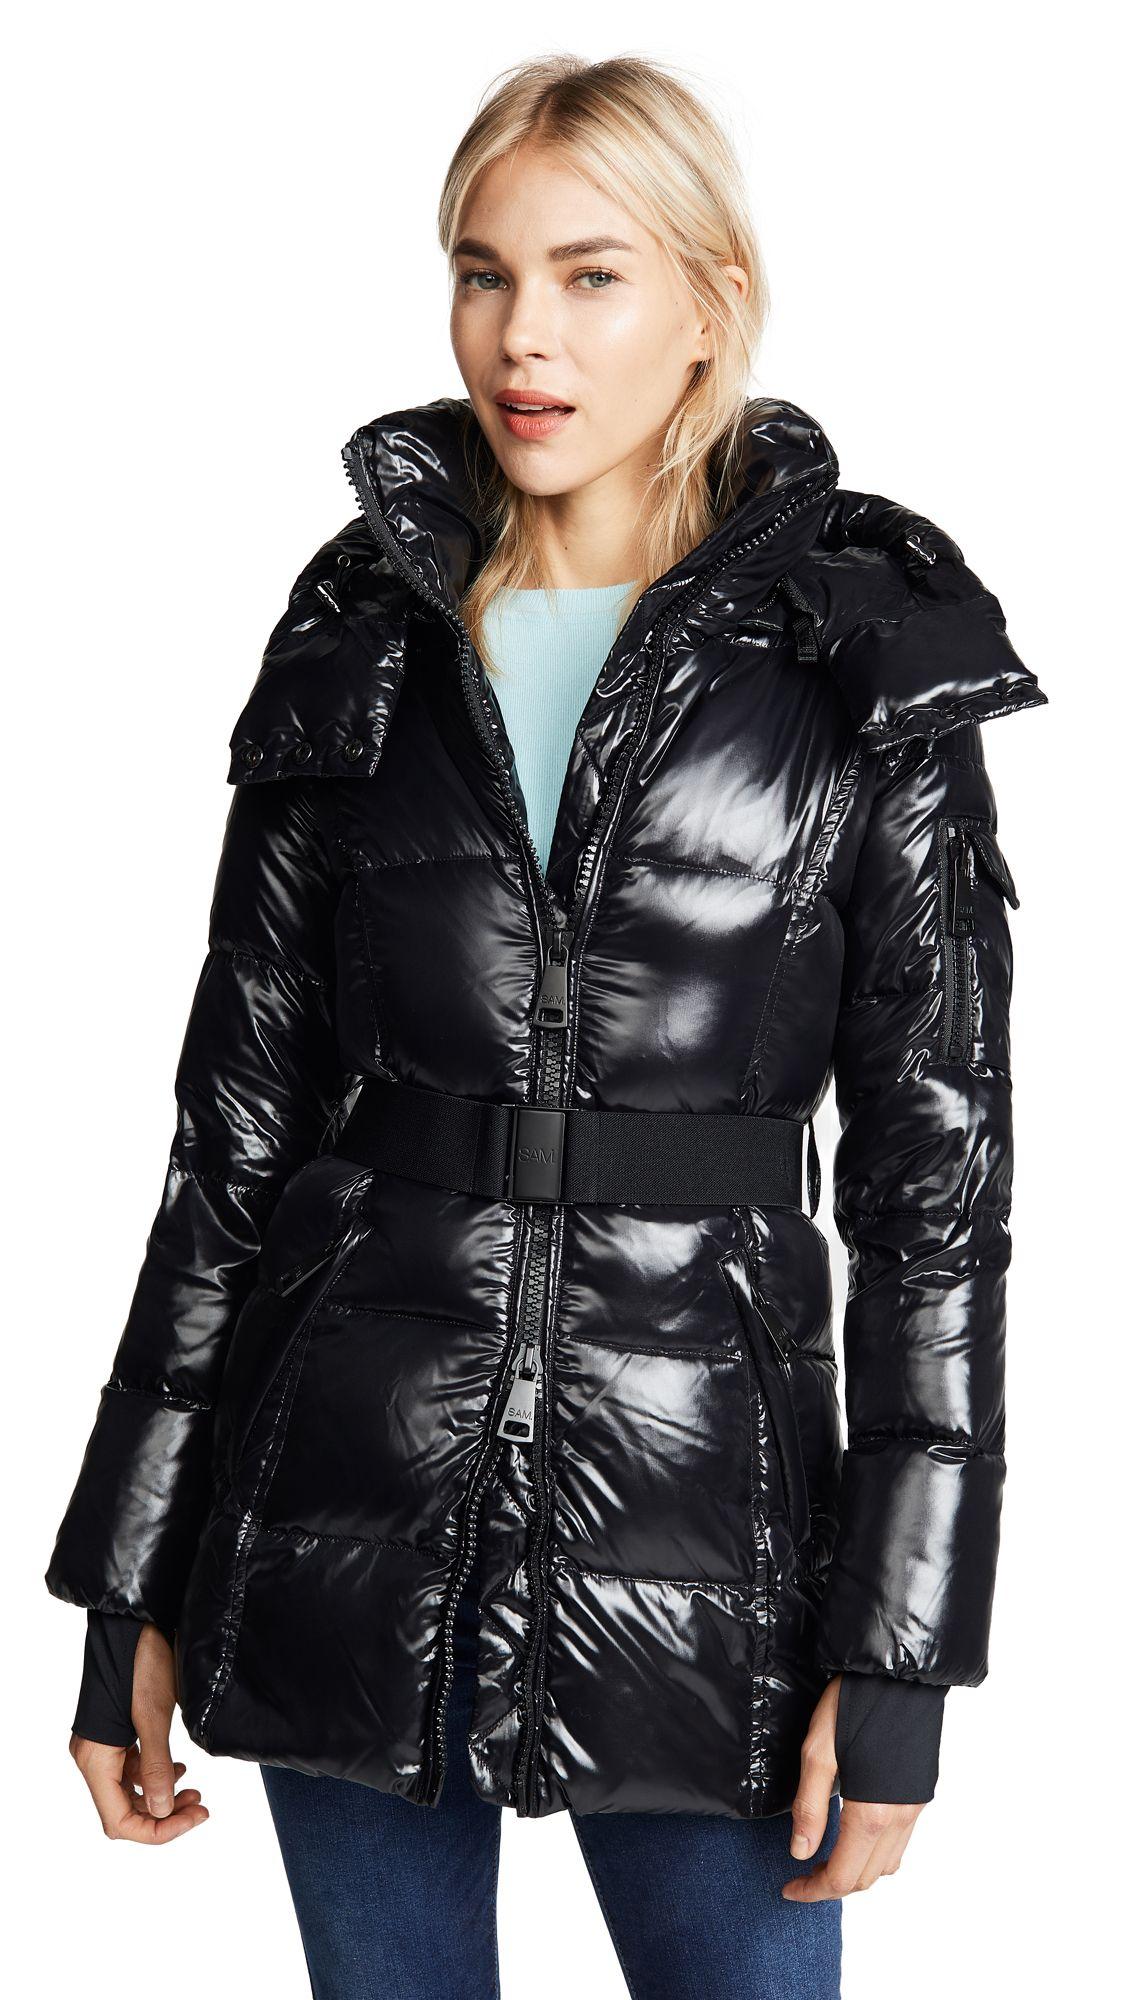 Sam Soho Long Down Jacket Shopbop Down Jacket Jackets Shiny Jacket [ 2000 x 1128 Pixel ]